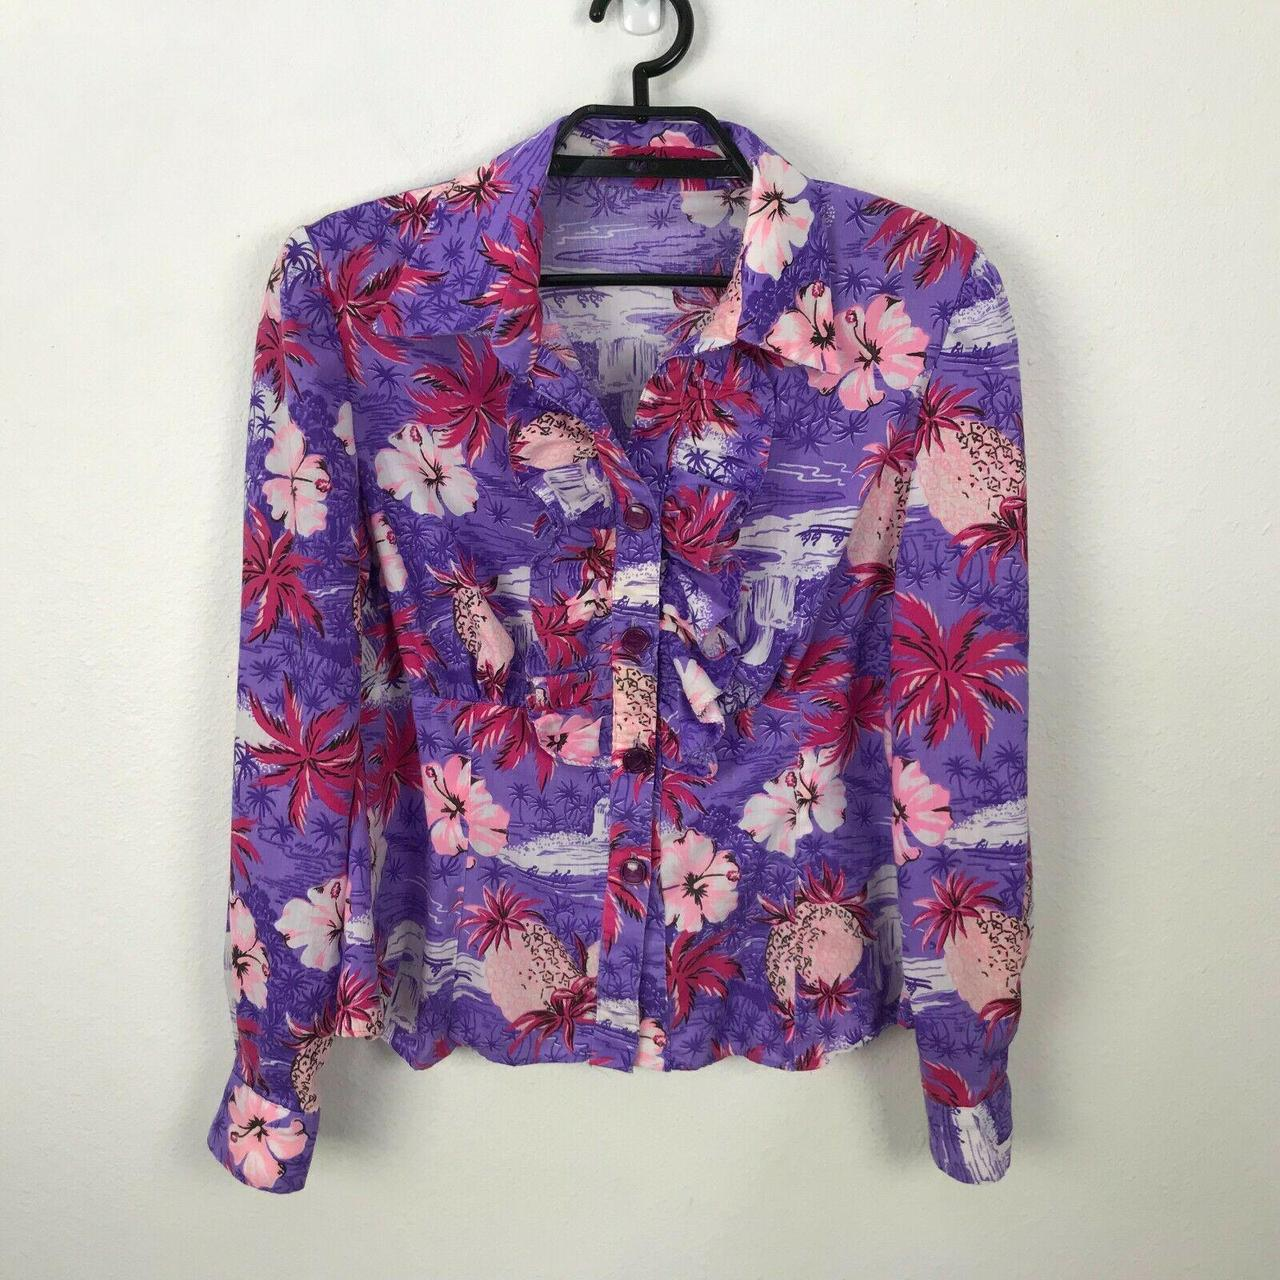 Product Image 1 - Vintage Hawaiian Shirt Size M